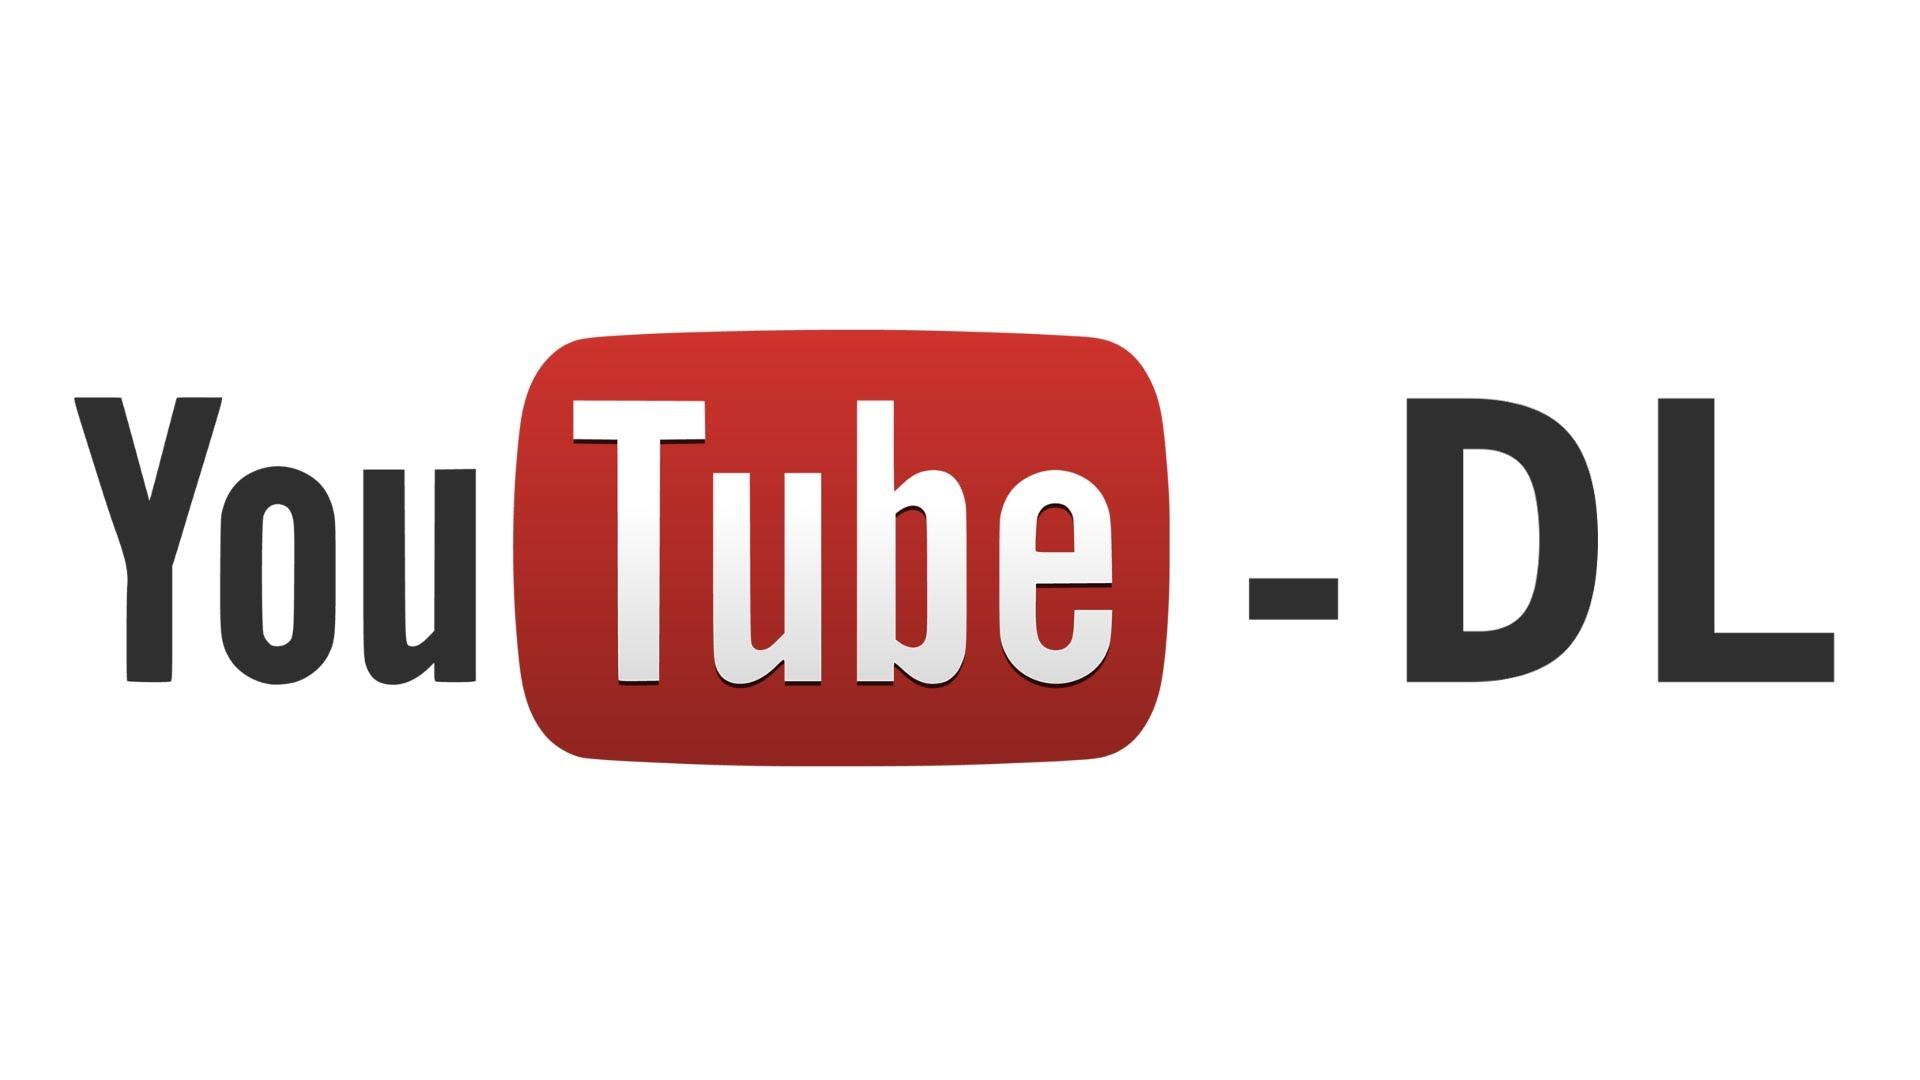 С GitHub удалили 18 программ для скачивания видео из YouTube